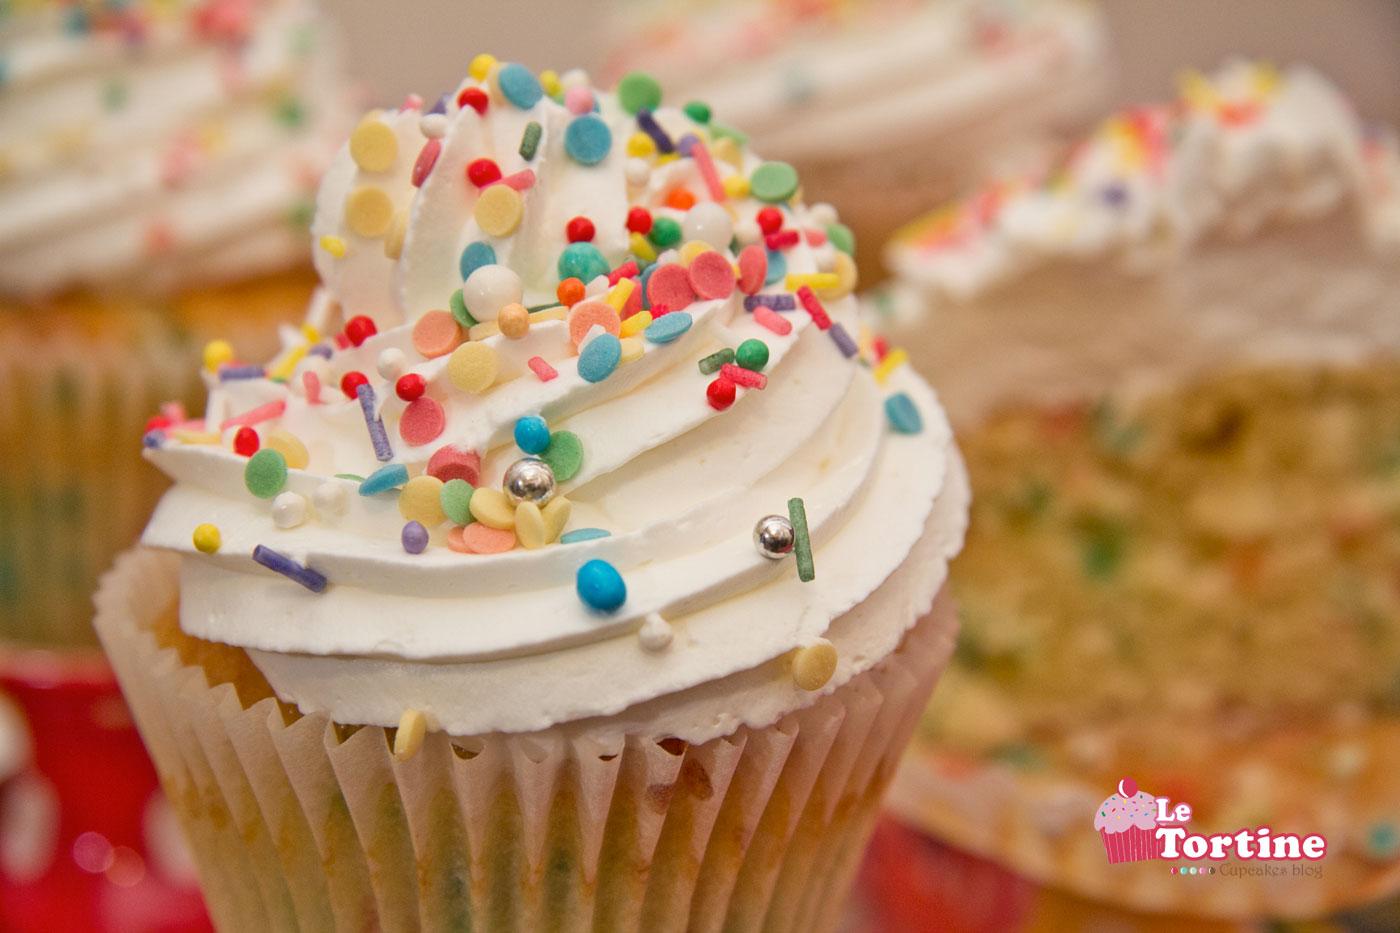 Carnevale 2013: Funfetti Cupcakes | Le Tortine - Cupcakes blog